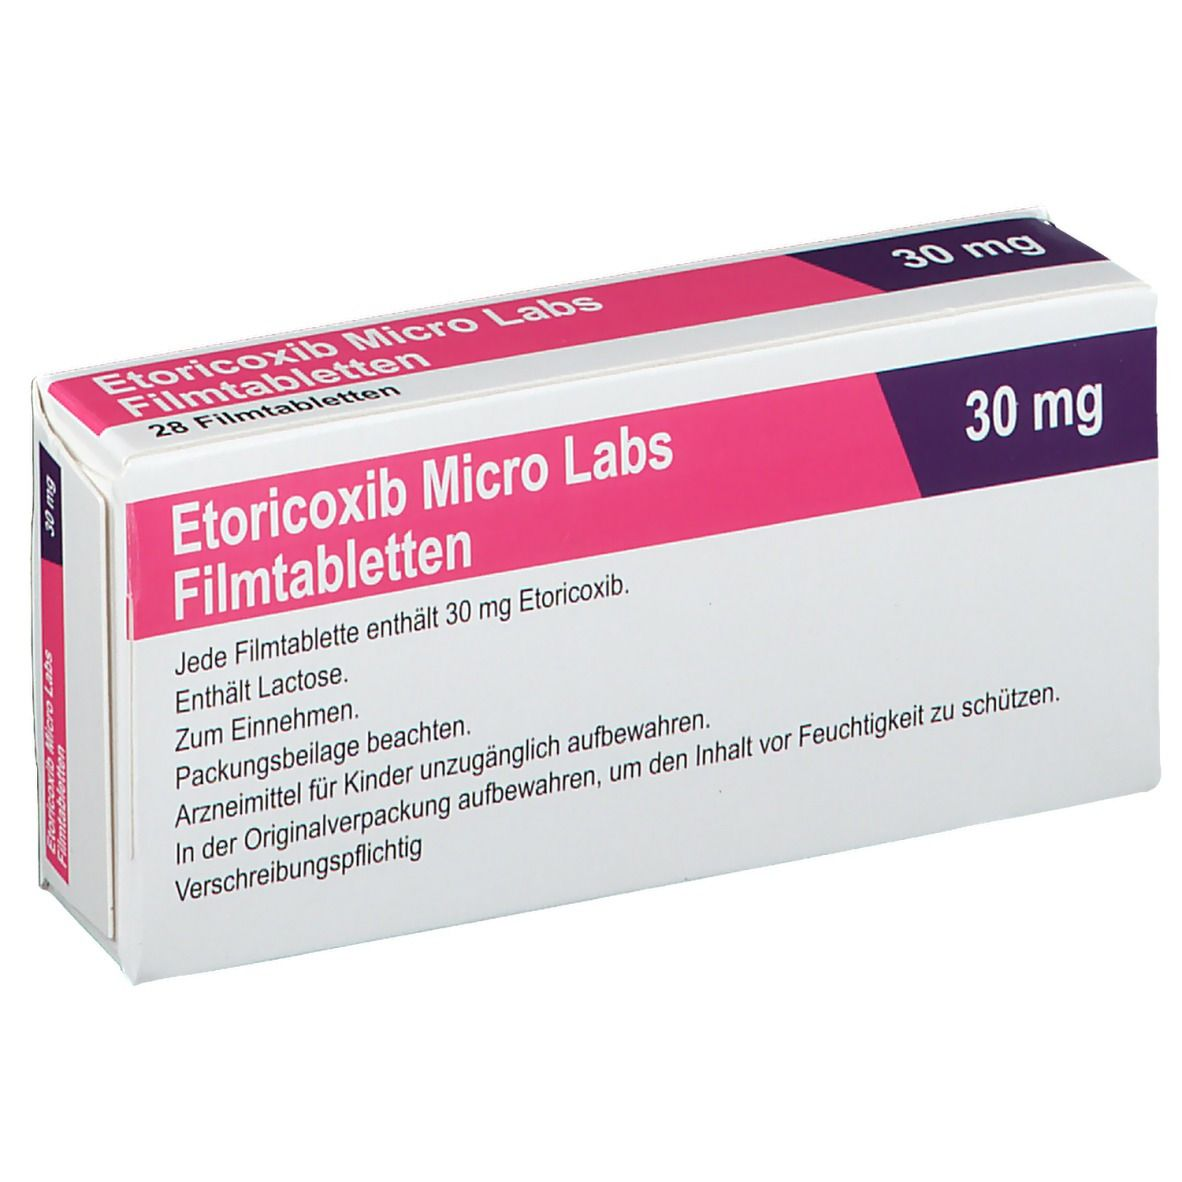 ETORICOXIB Micro Labs 30 mg Filmtabletten